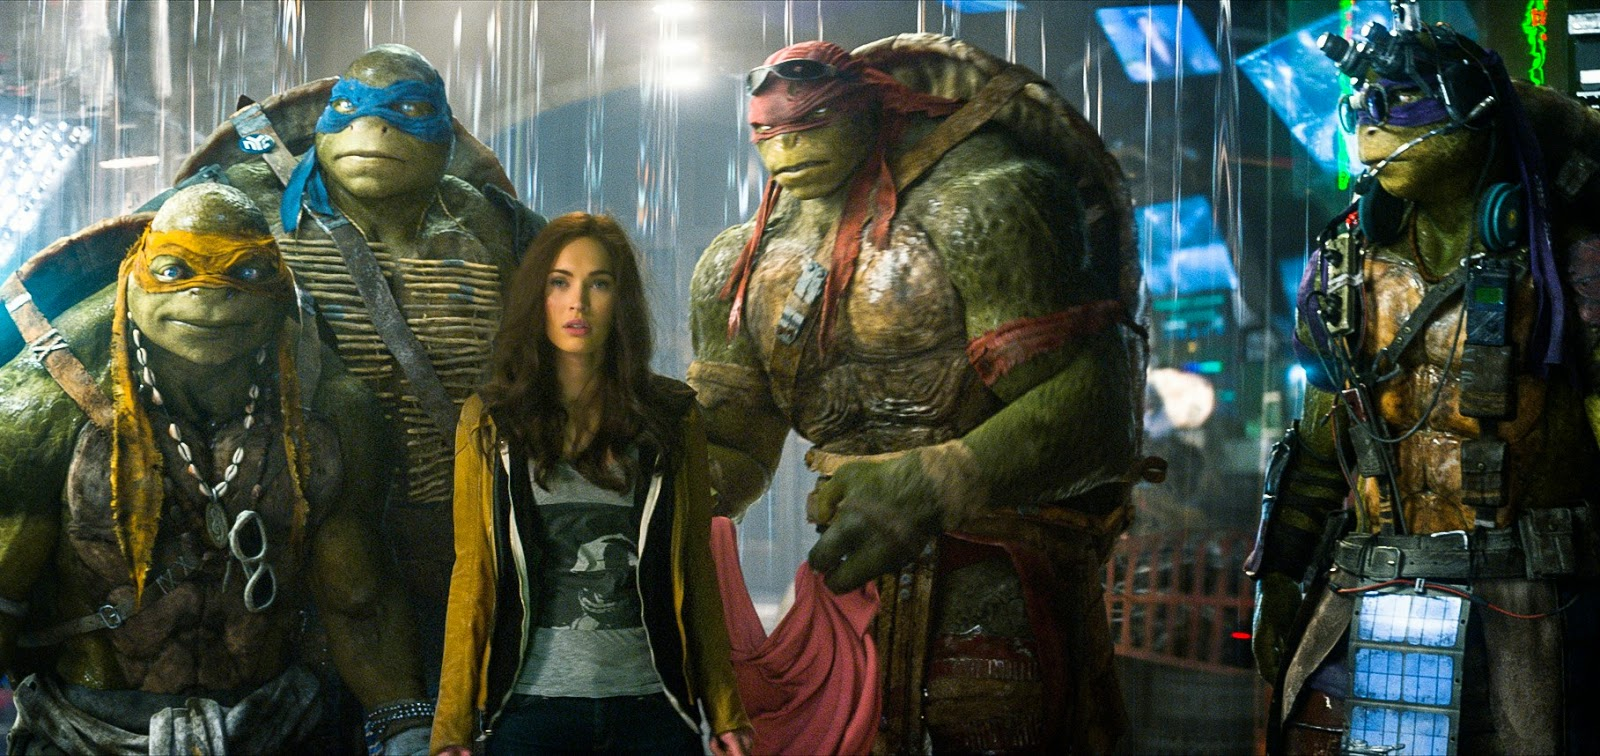 Paramount anuncia sequência de As Tartarugas Ninja para 2016